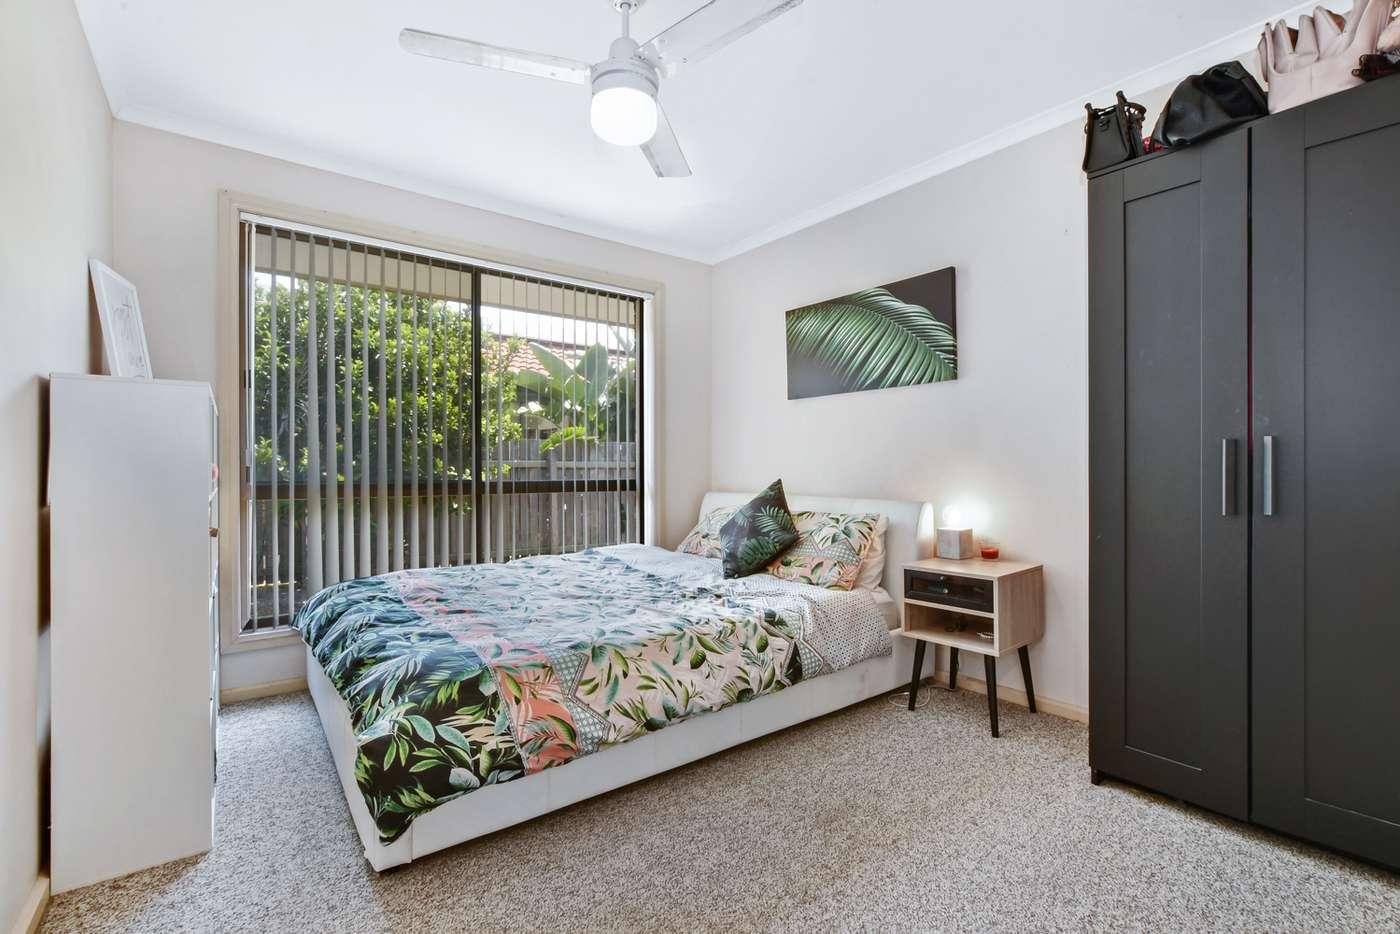 Sixth view of Homely house listing, 39 Kookaburra Crescent, Bokarina QLD 4575